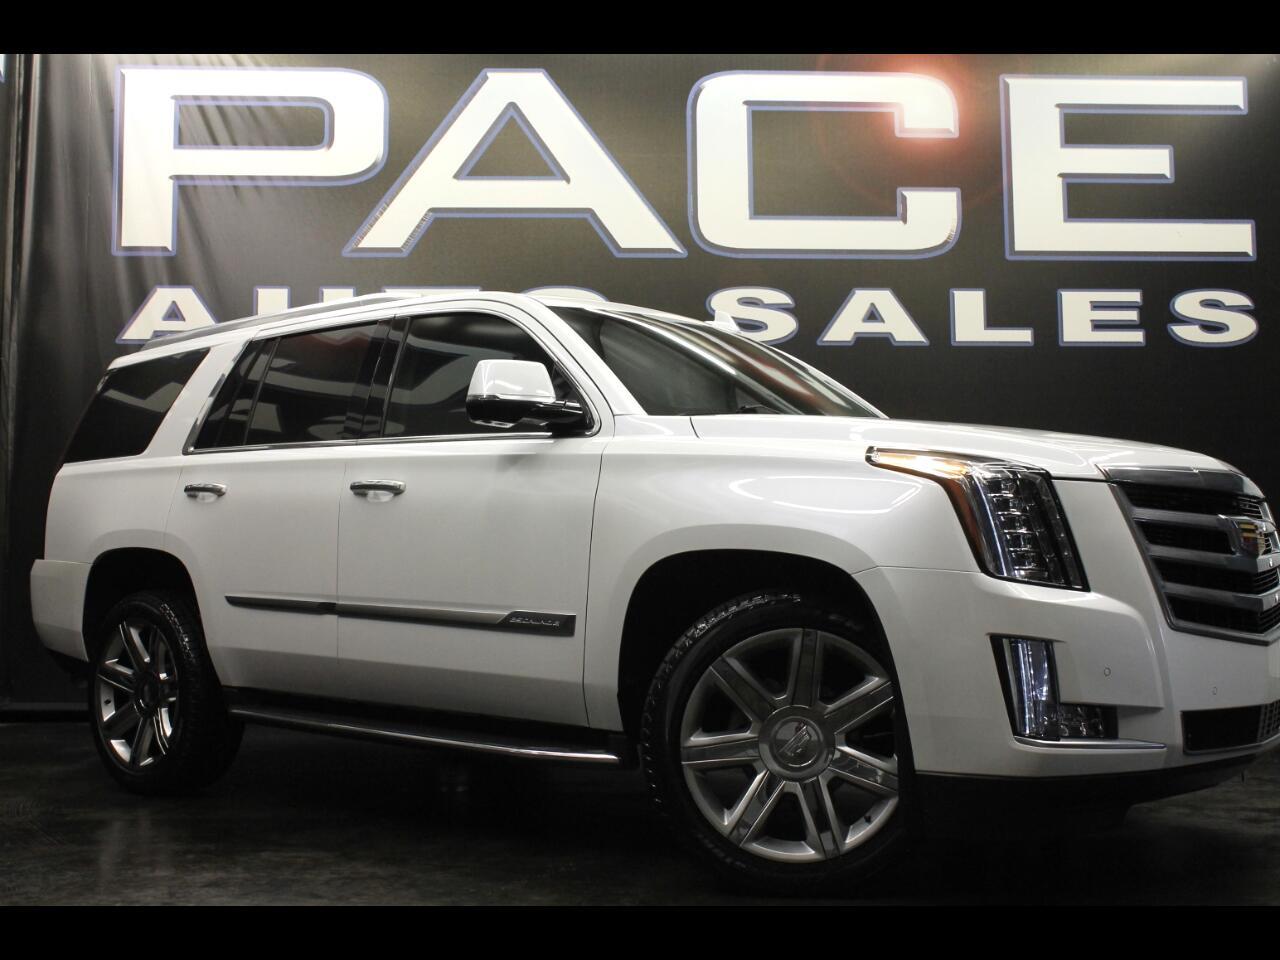 2016 Cadillac Escalade 2WD 4dr Luxury Collection